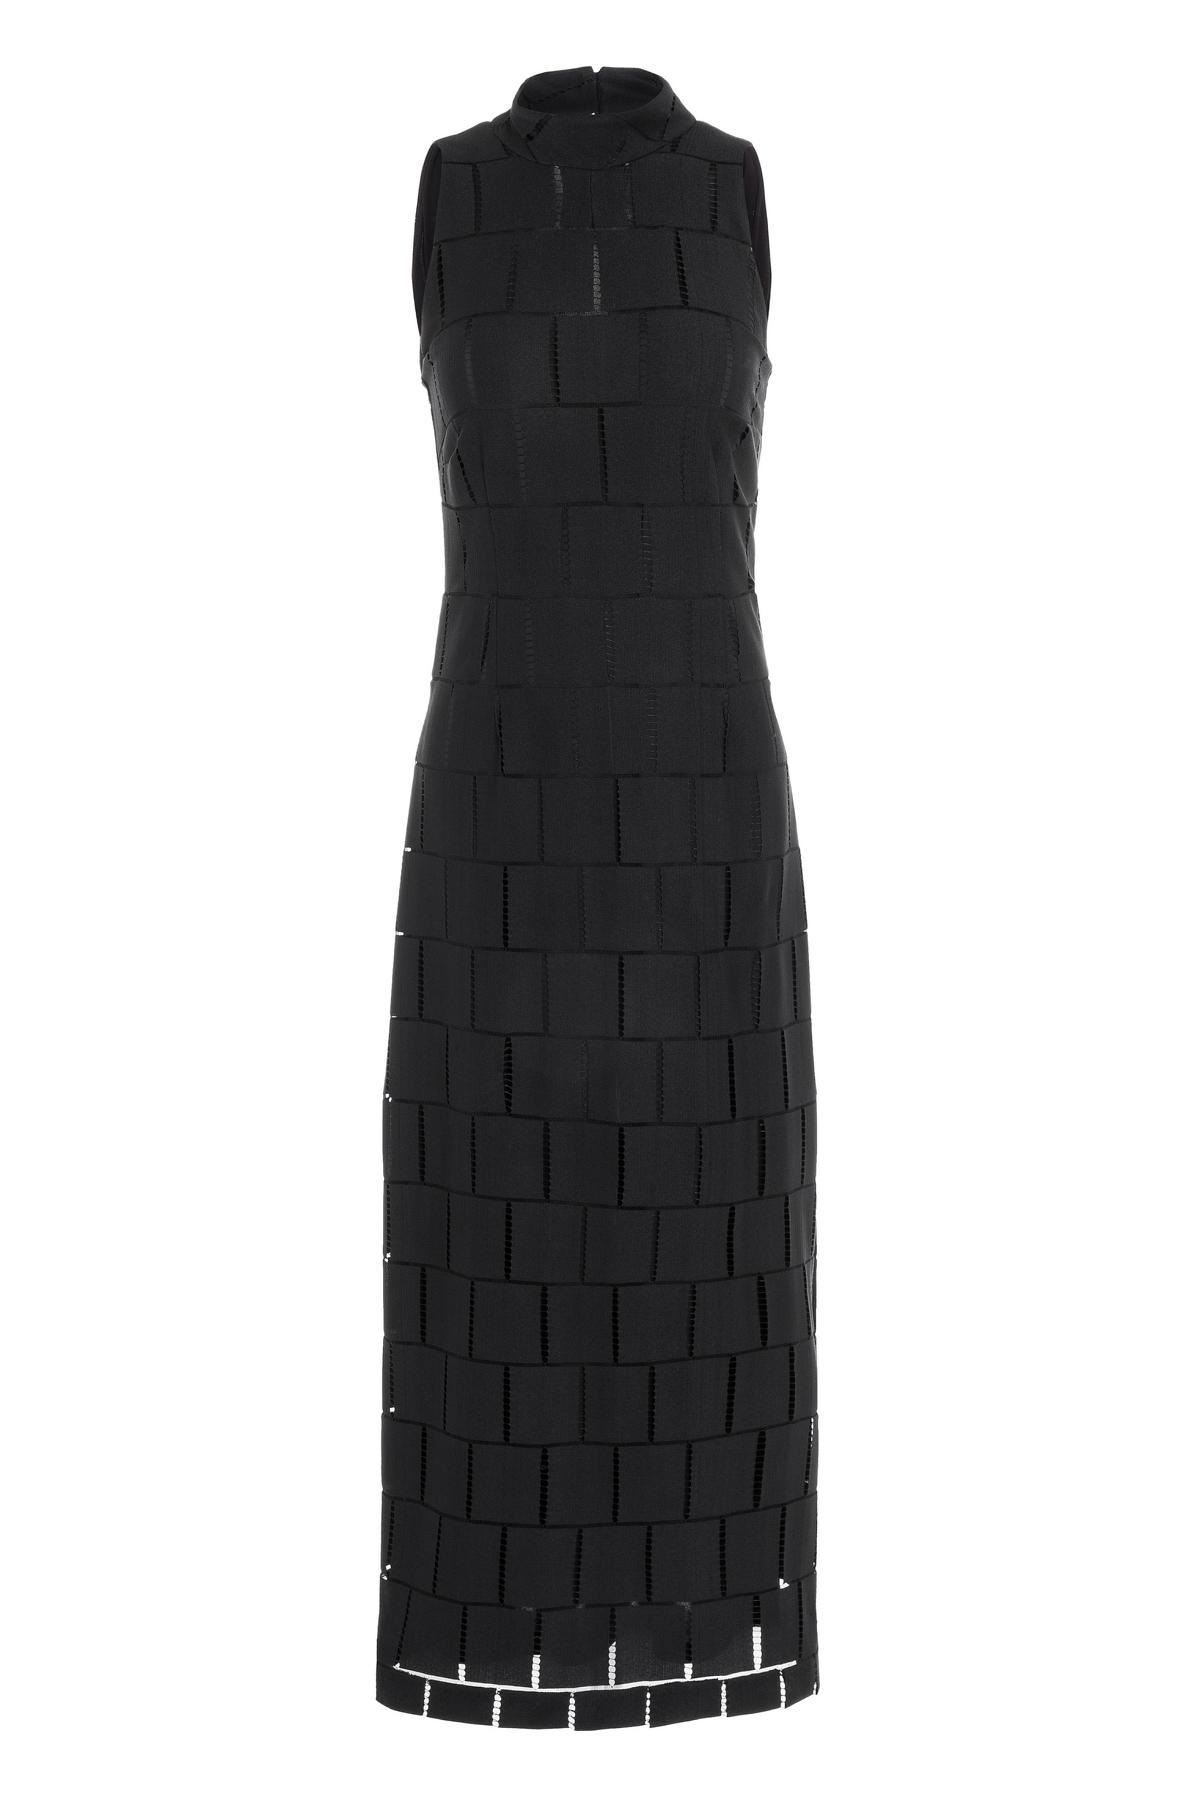 Ana Alcazar Maxi Dress Samita Black